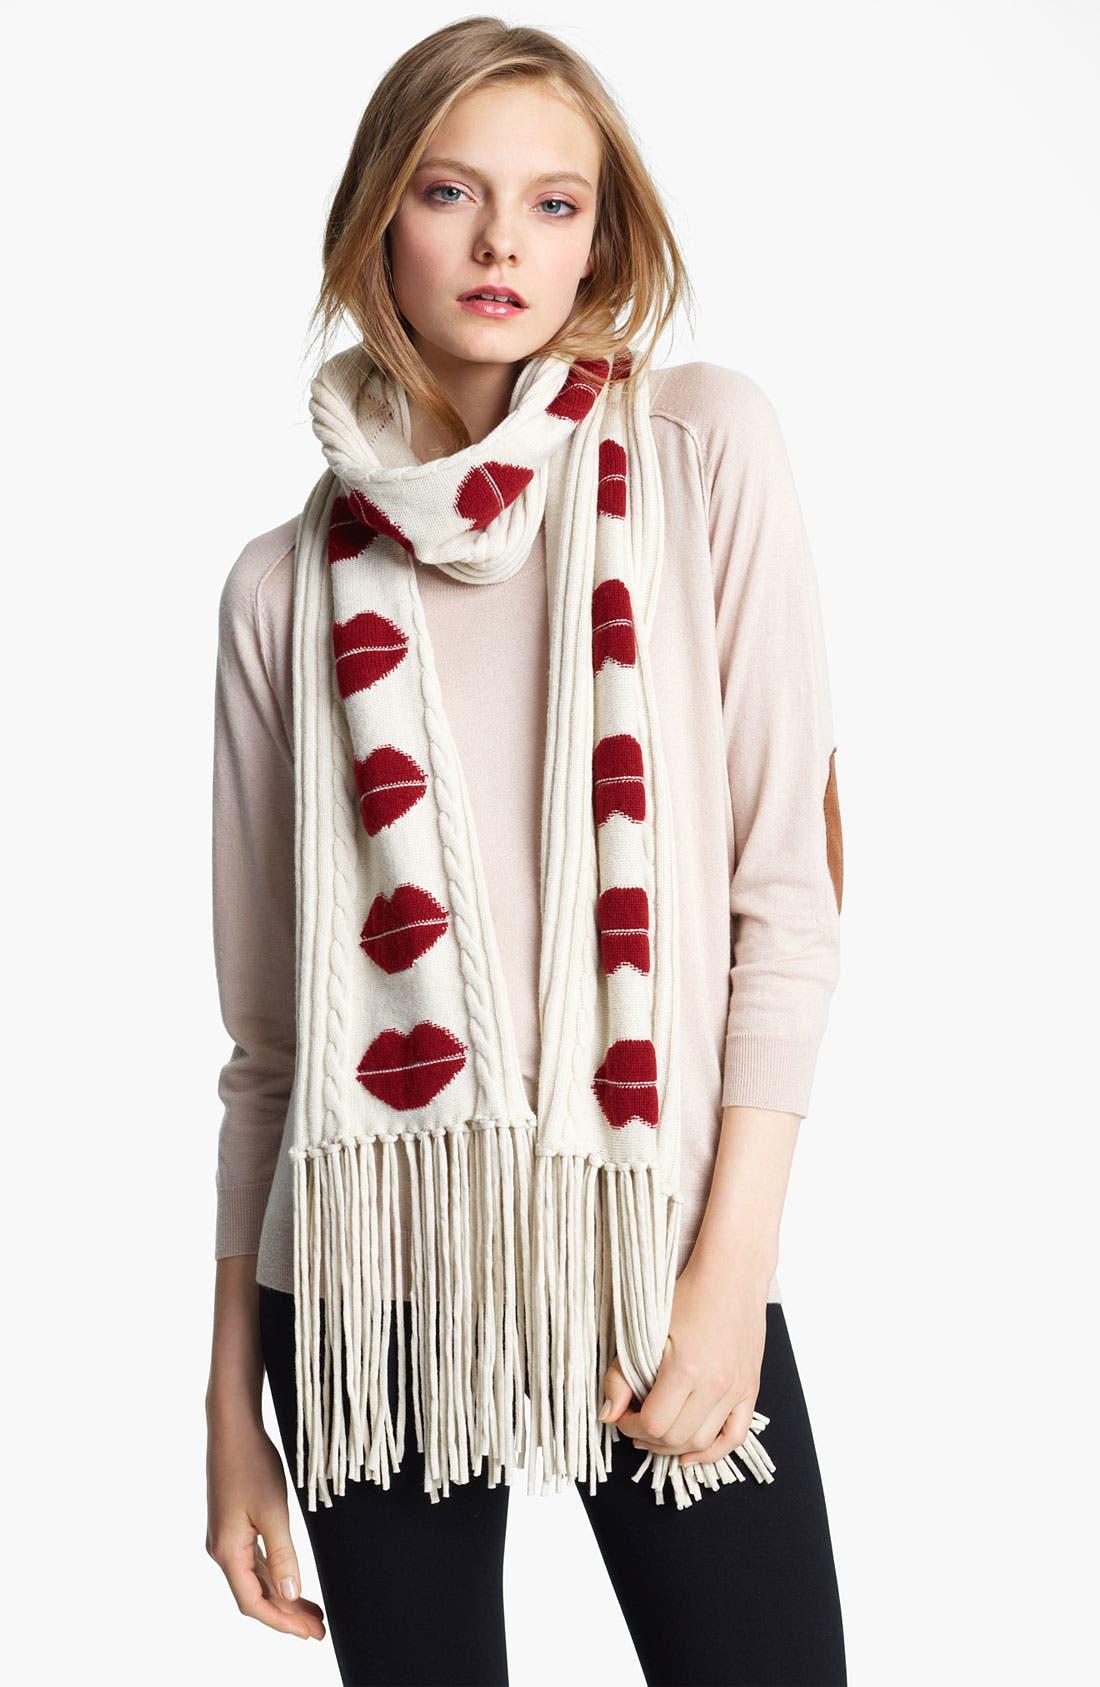 Main Image - Sonia Rykiel 'Lips' Wool & Cashmere Scarf